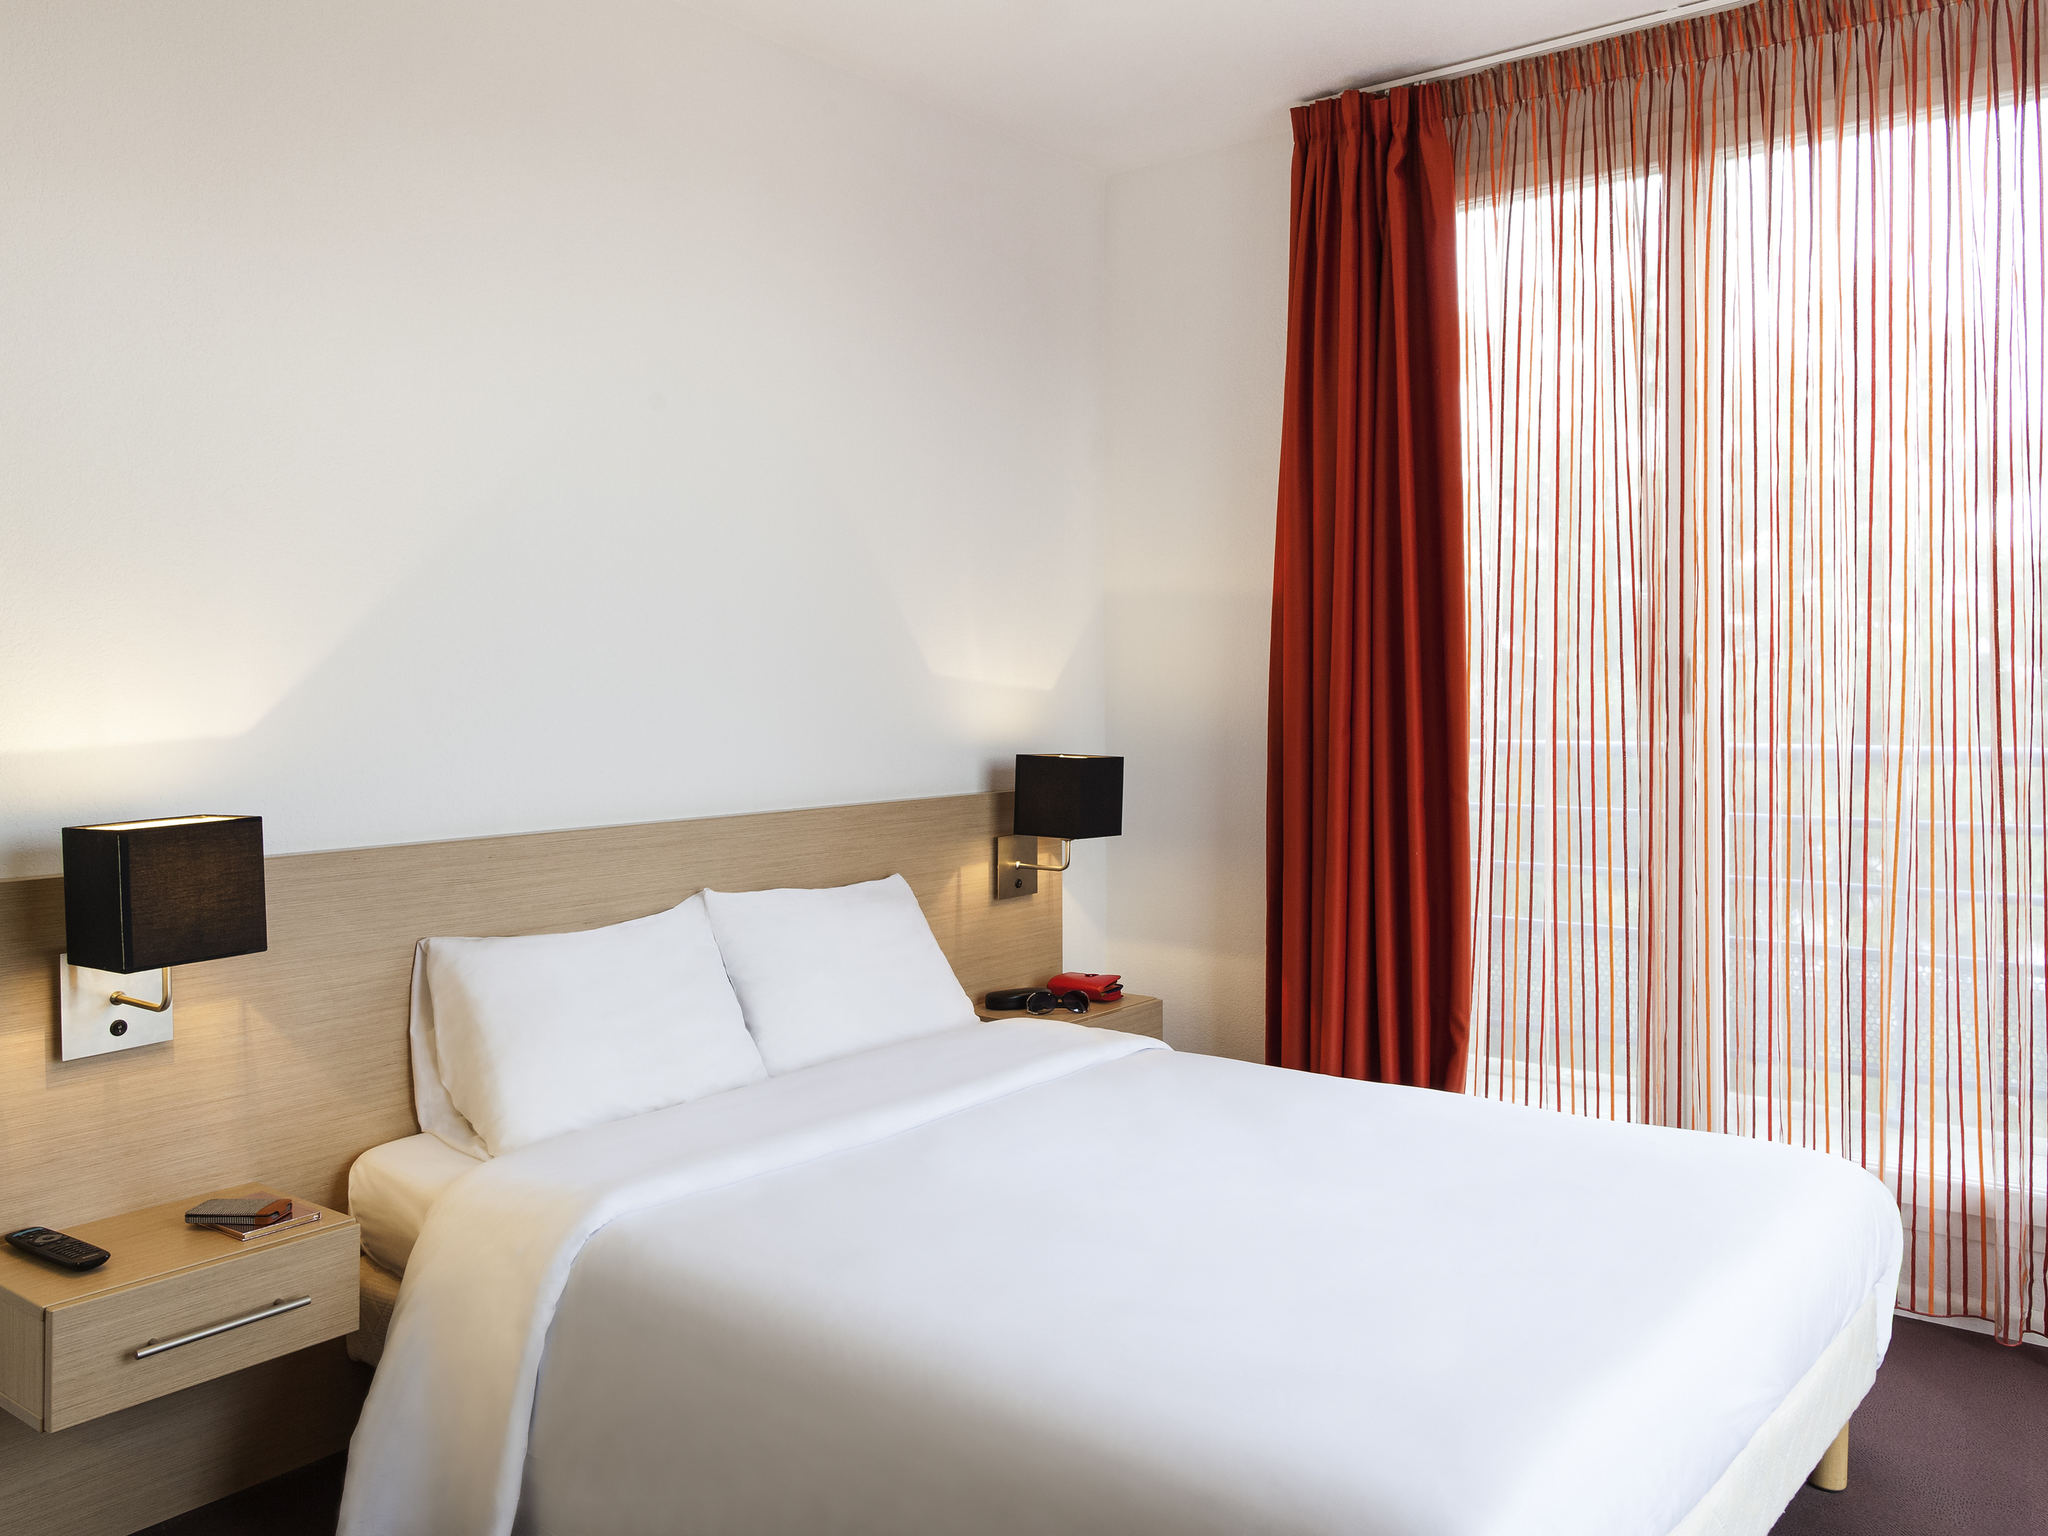 Hotel Saint Louis Bale